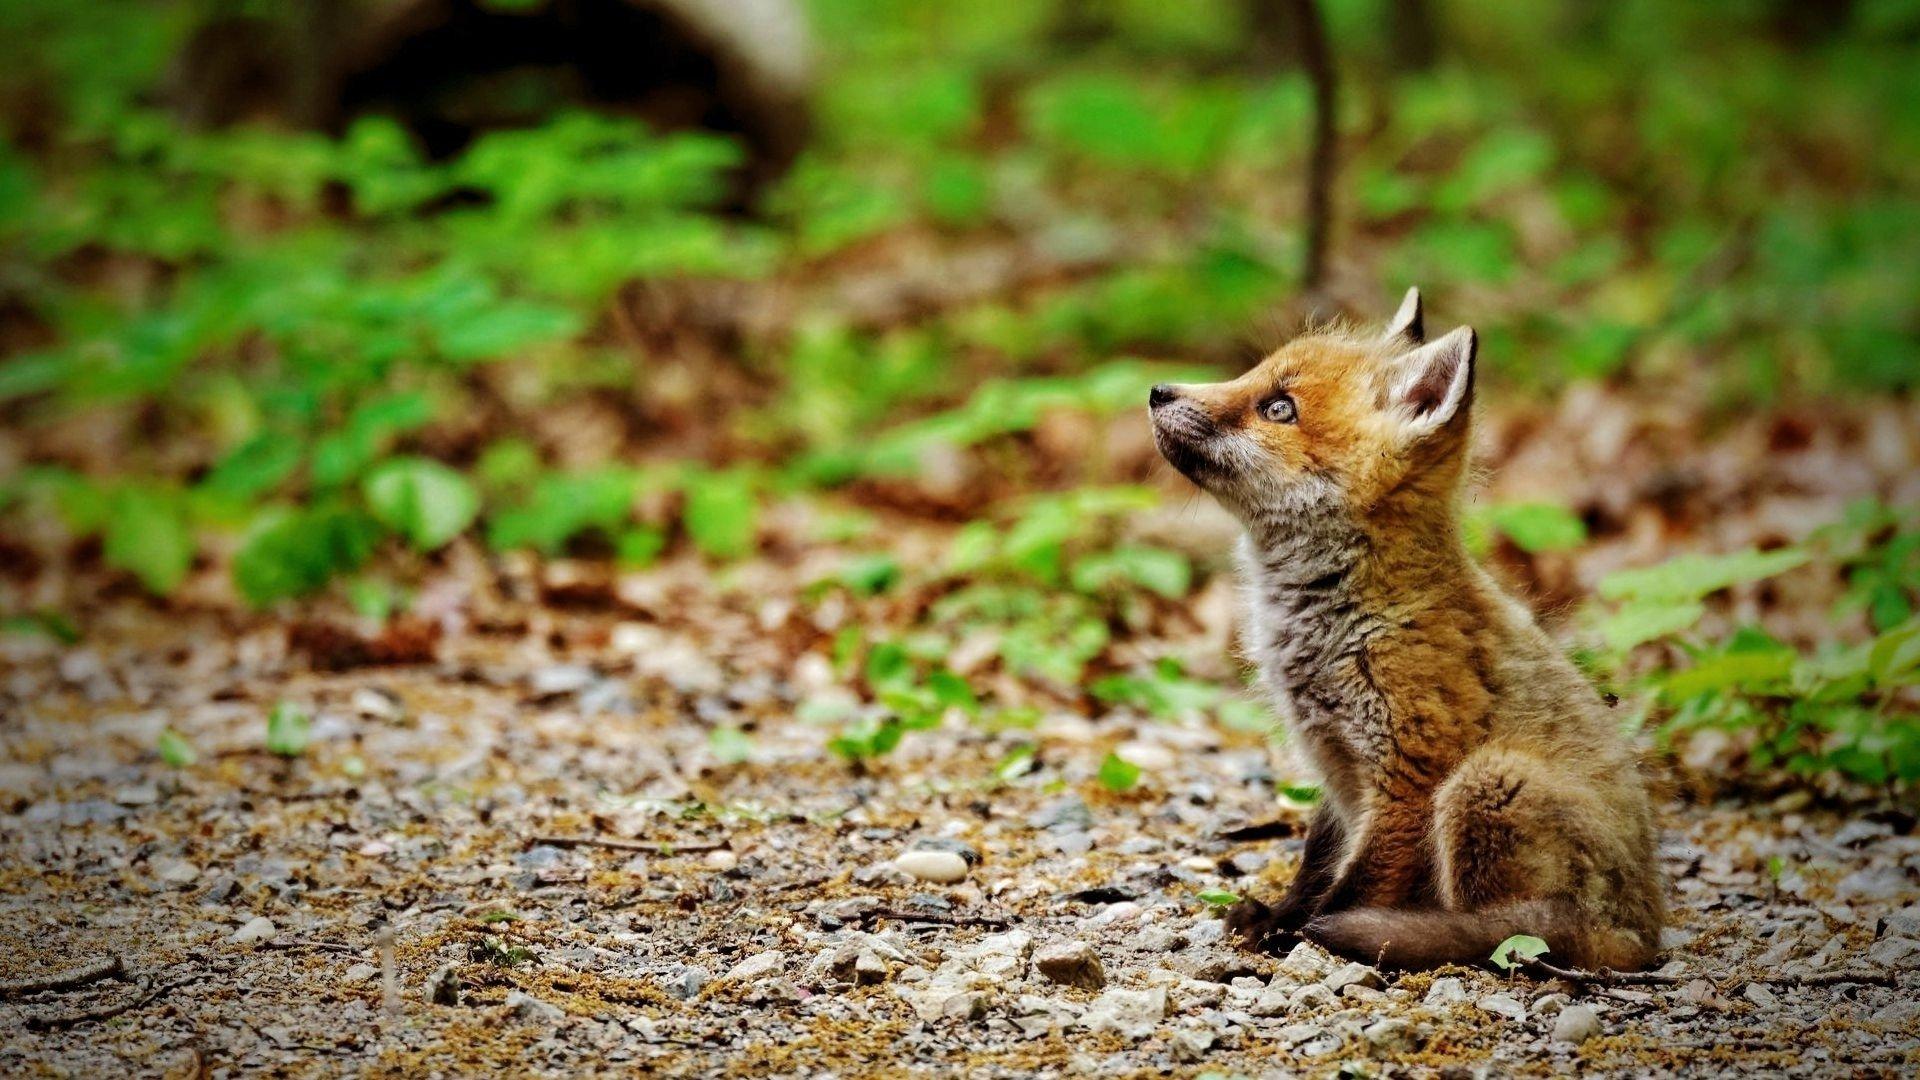 Baby Animal Wallpaper For Desktop: Fox Full HD Wallpaper And Background Image